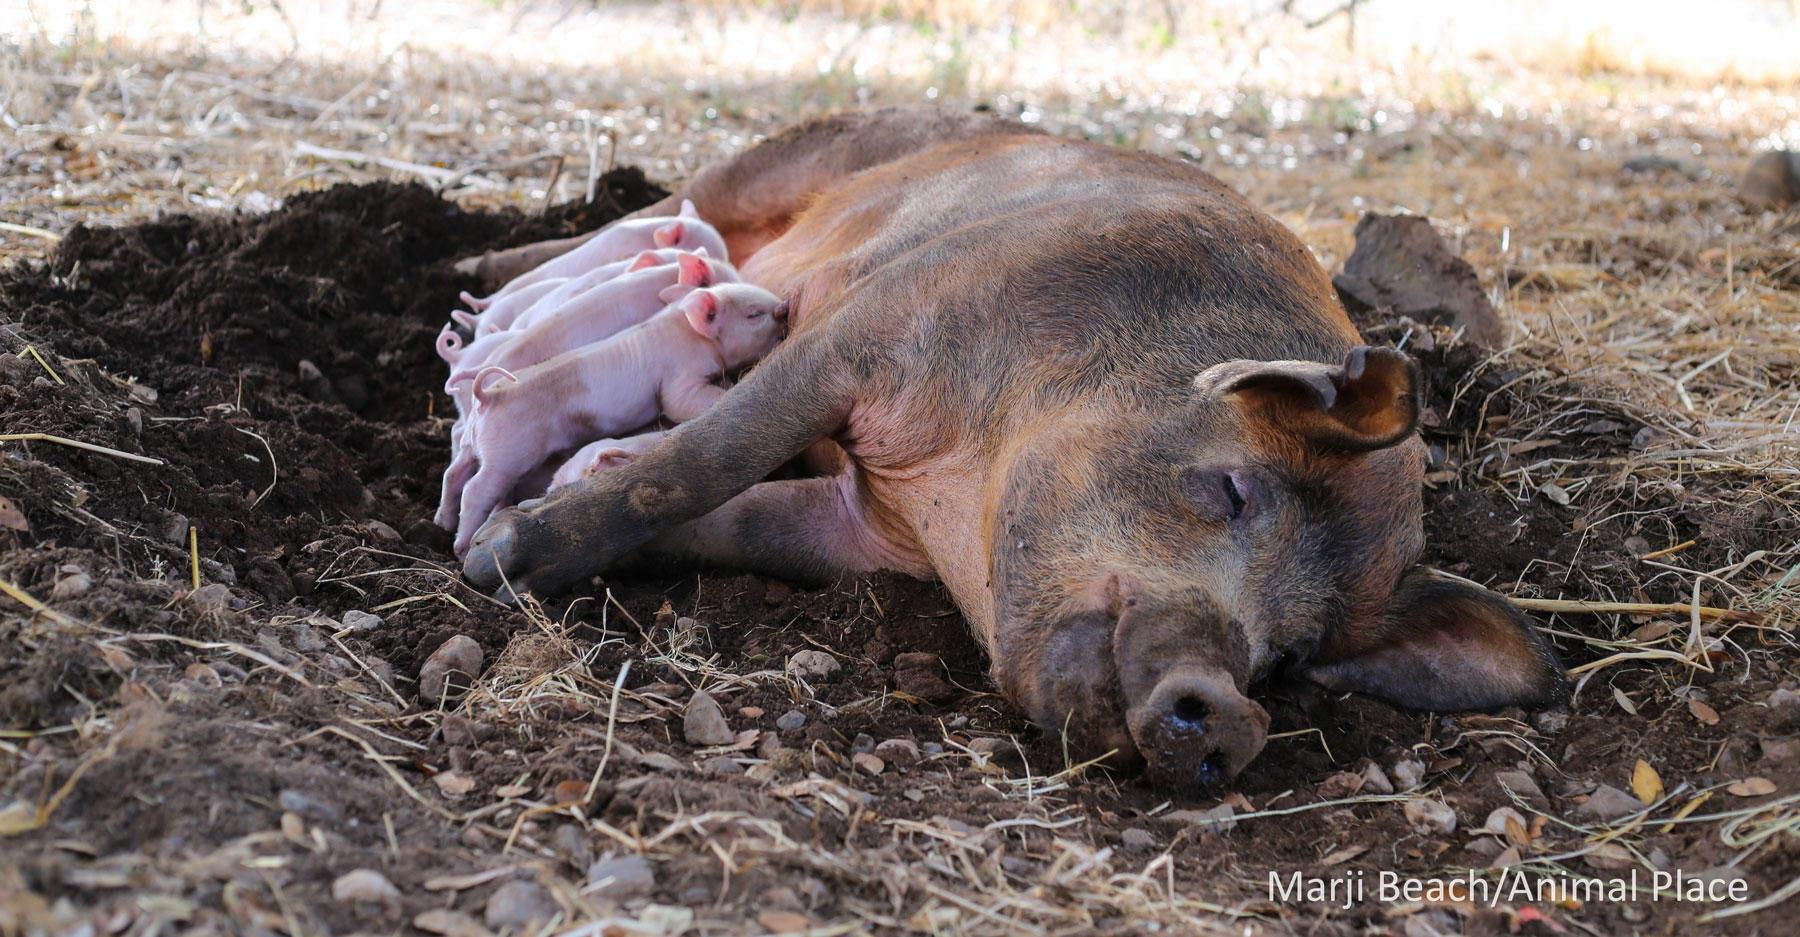 Rita the Pig